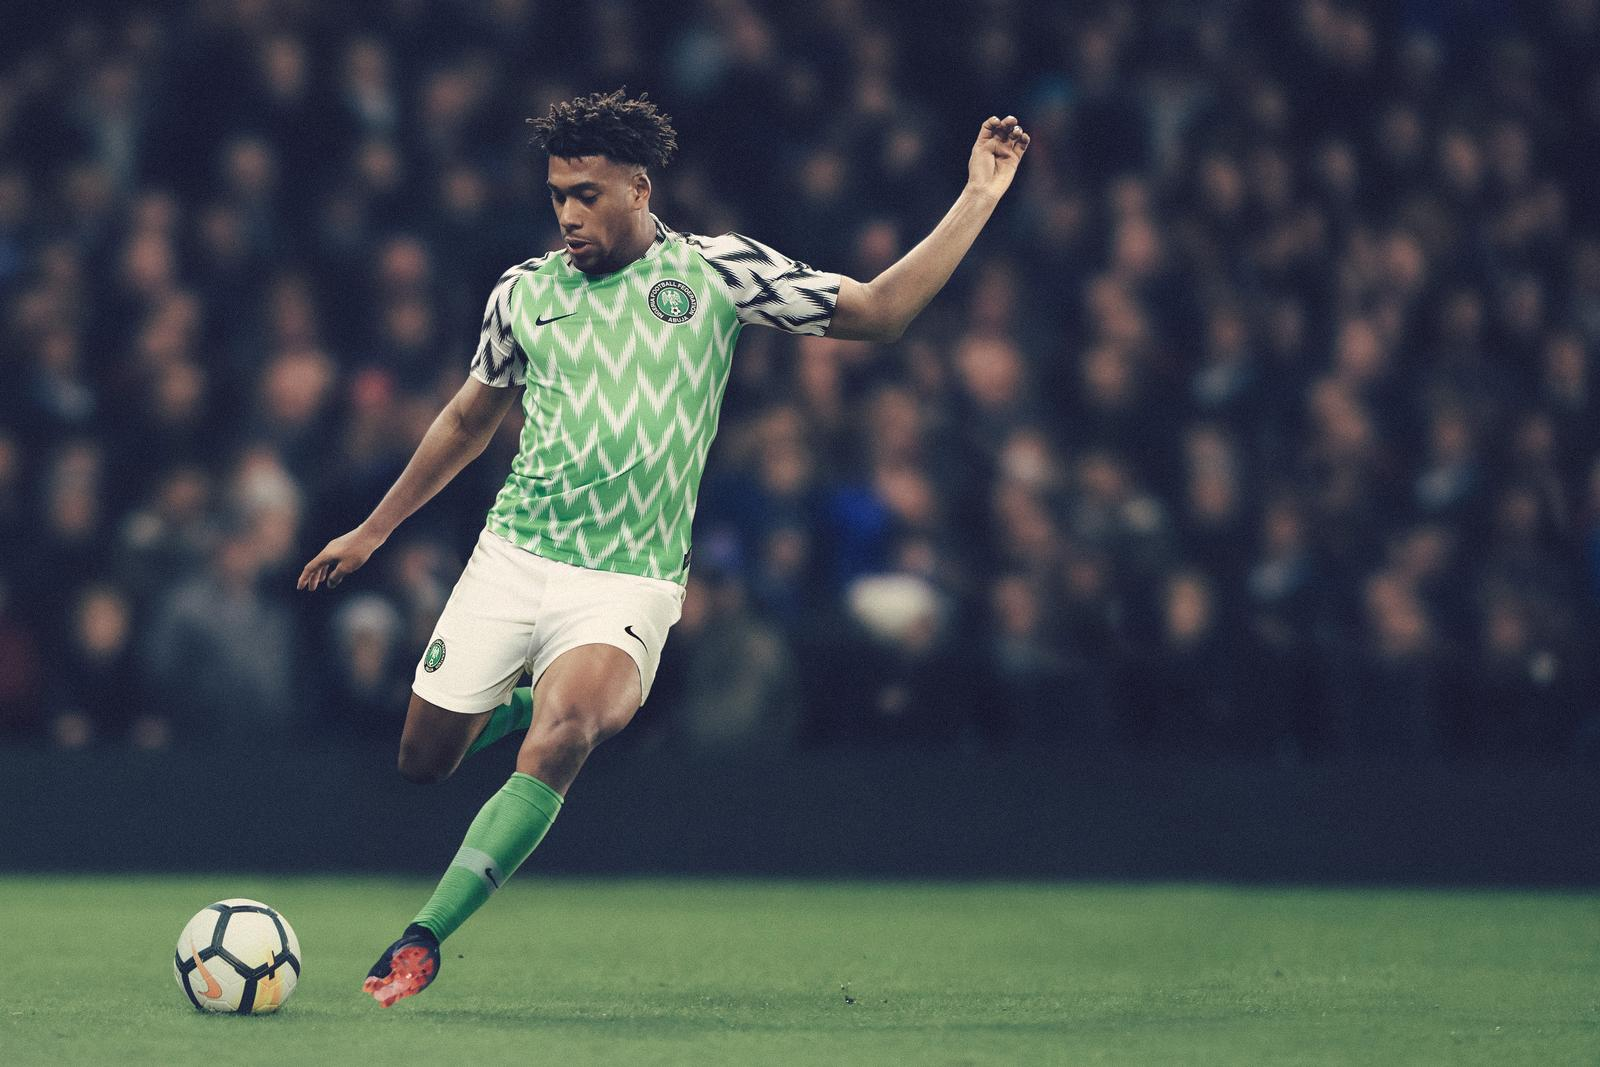 nigeria_2018_world_cup_nike_home_kit_b.jpg